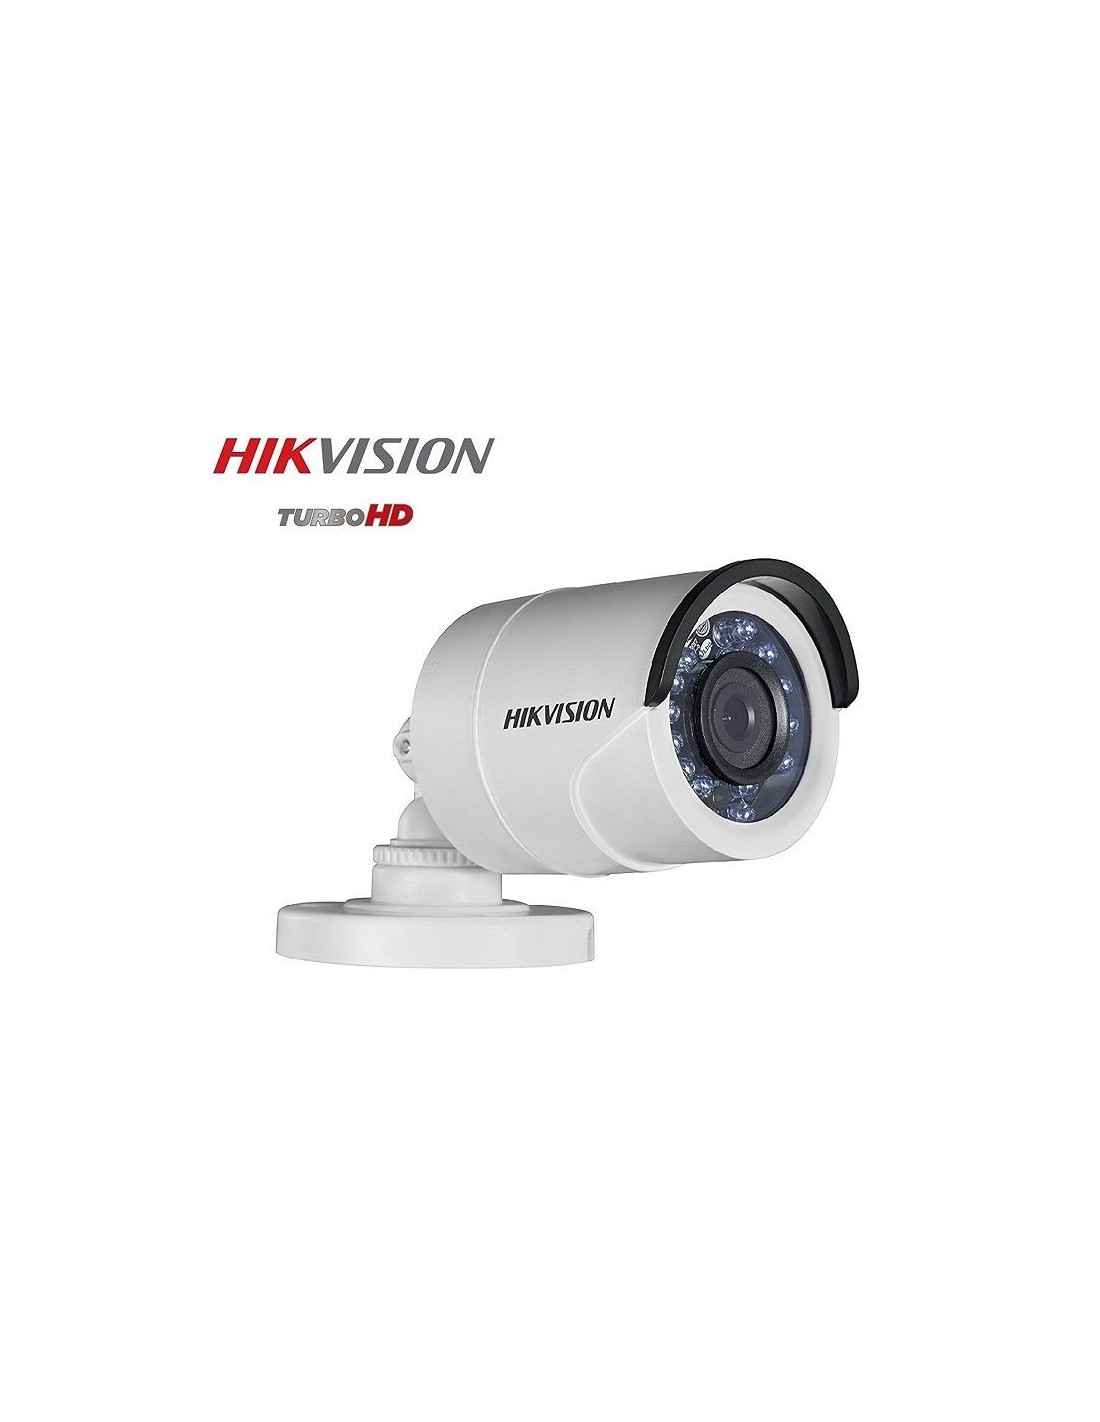 camera de surveillance prix